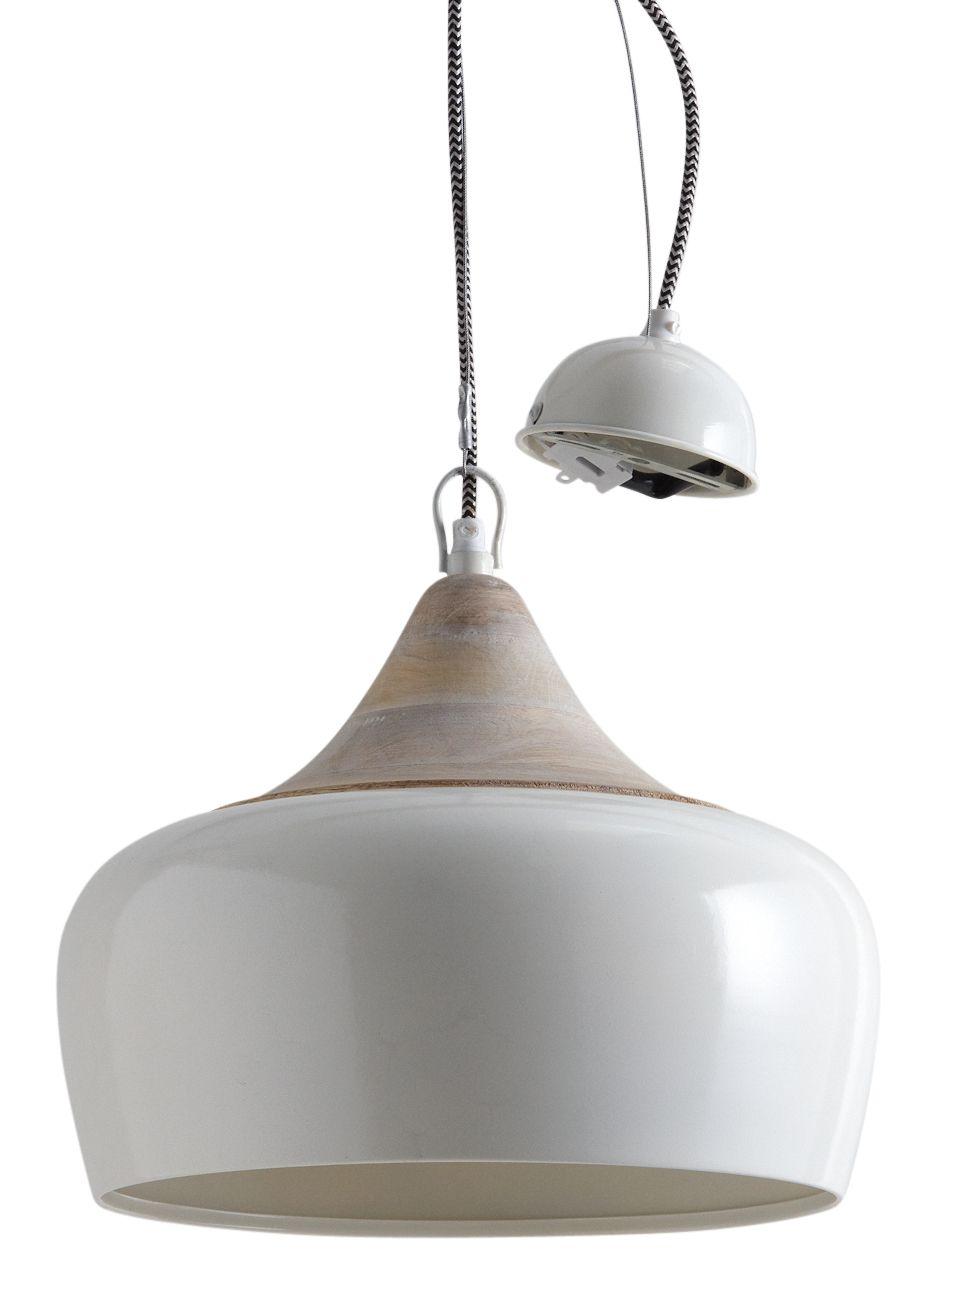 lampe suspension en m tal laqu et bois. Black Bedroom Furniture Sets. Home Design Ideas